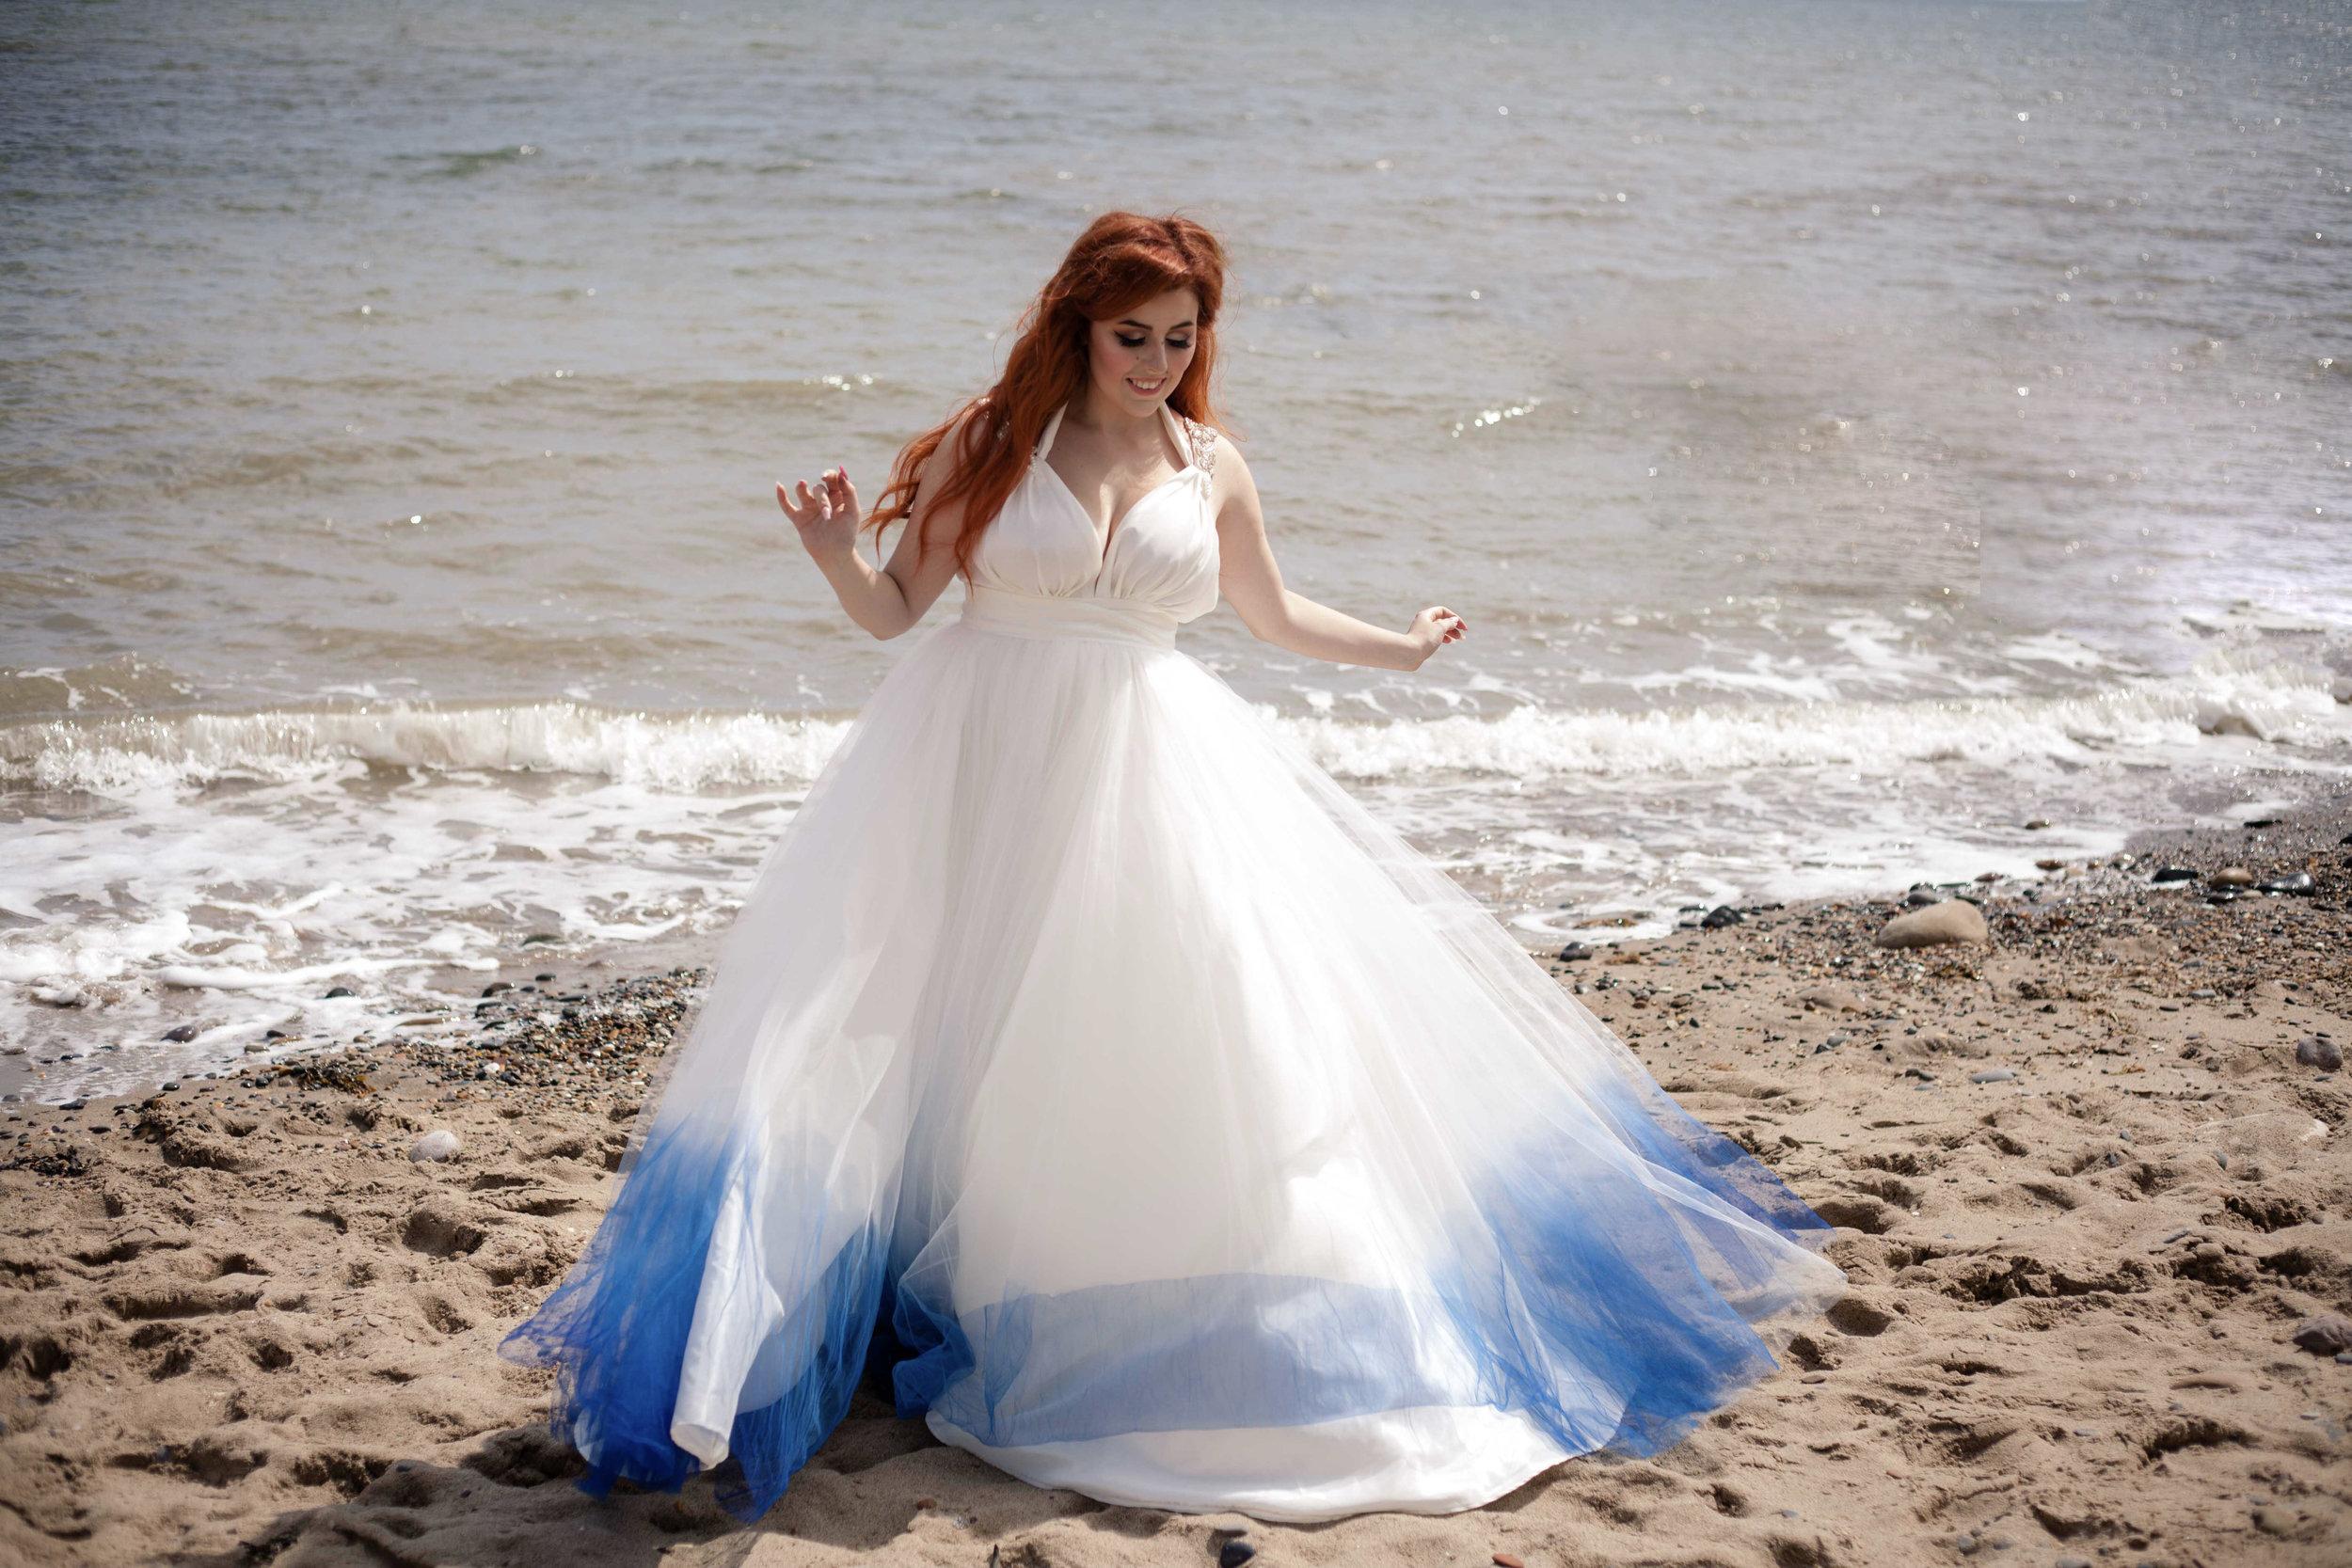 2018-07-21 - Disney The Little Mermaid-193.jpg